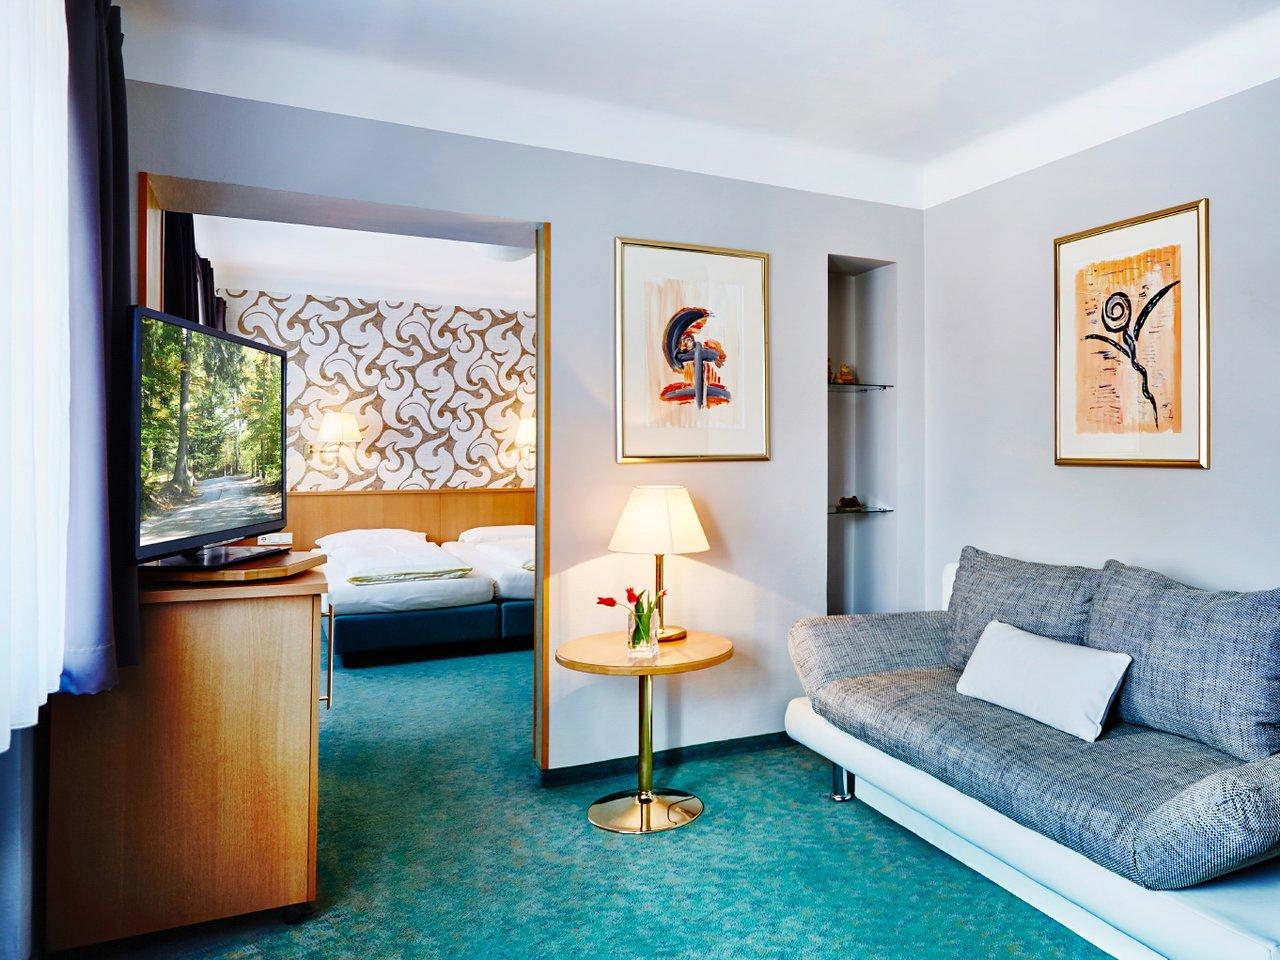 Hotel jacoby kleinbettingen luxembourg wedding trackside virtual betting sites